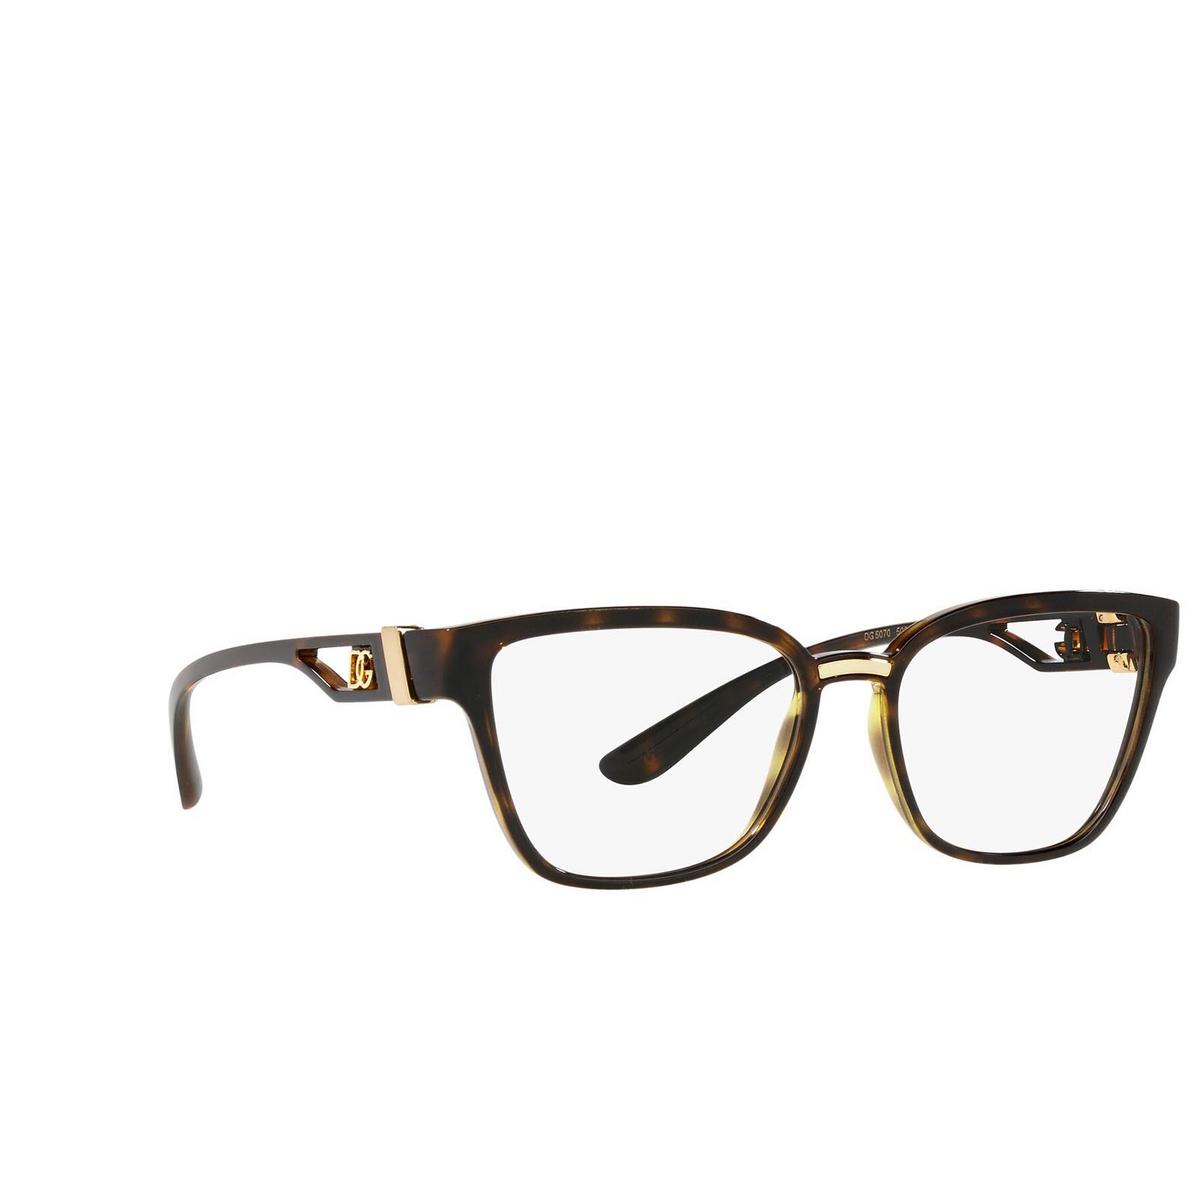 Dolce & Gabbana® Cat-eye Eyeglasses: DG5070 color Havana 502 - three-quarters view.